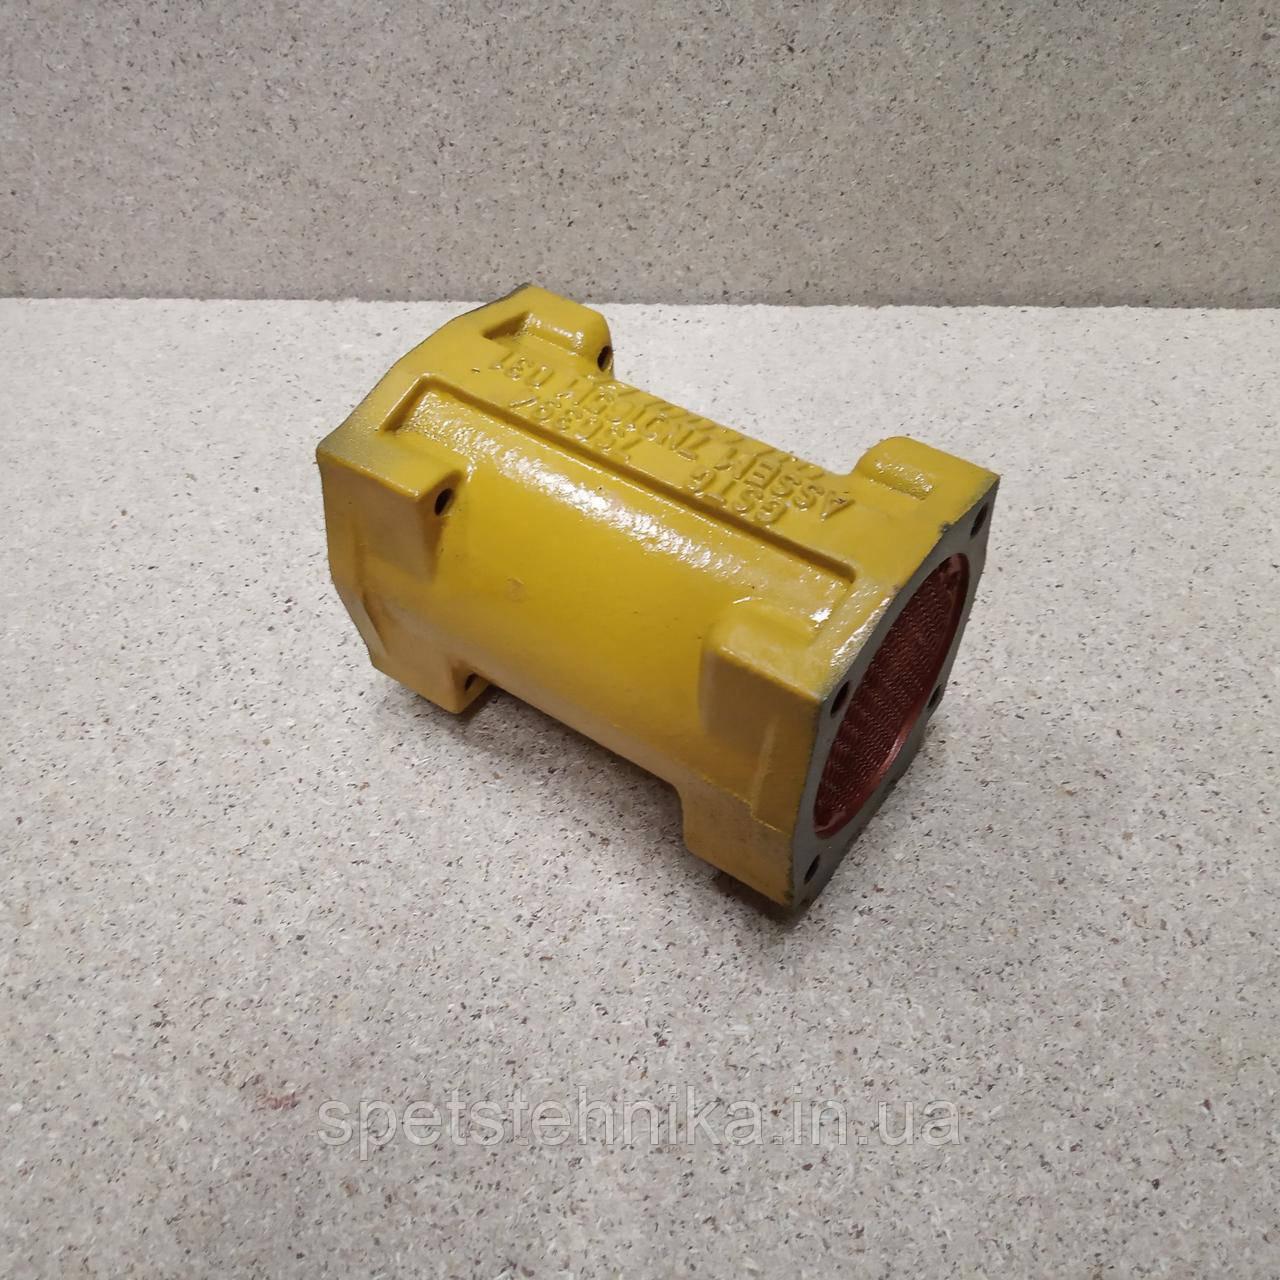 7N0165 теплообменник